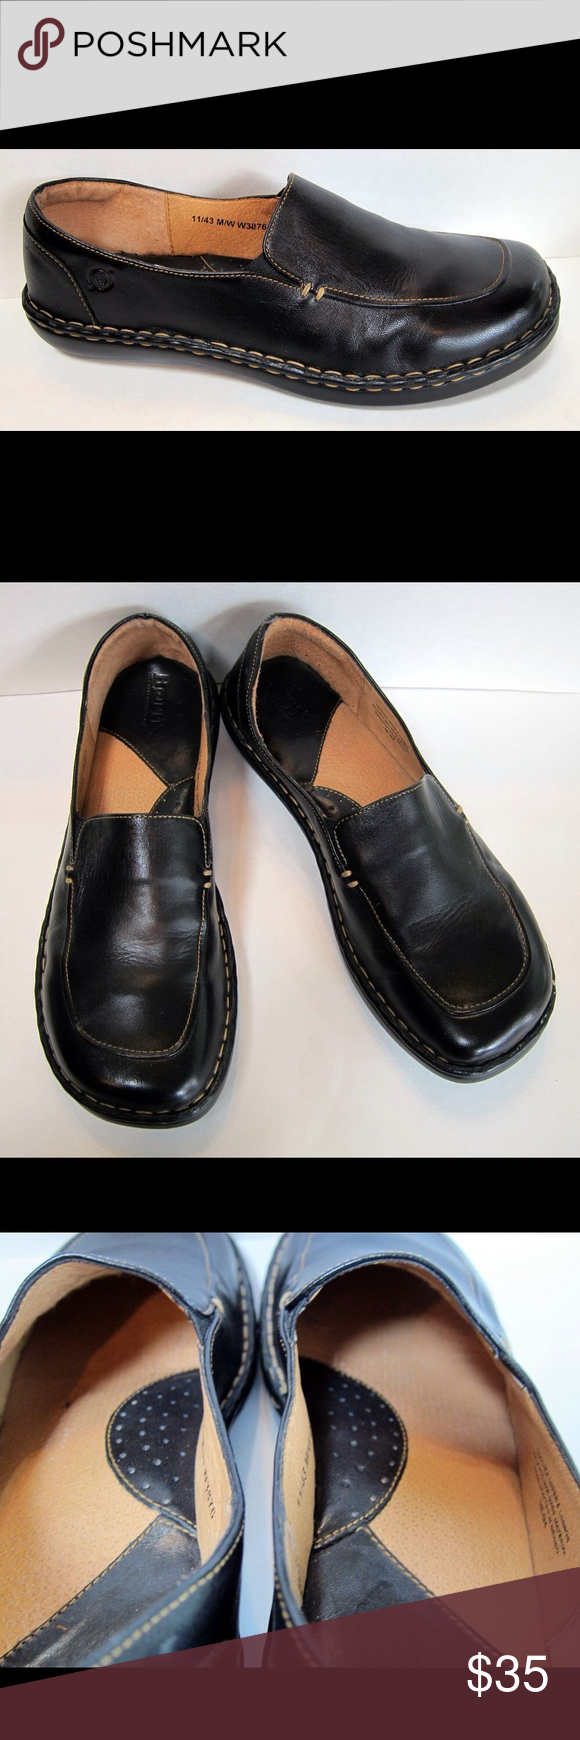 BORN Black Leather Loafer W3876